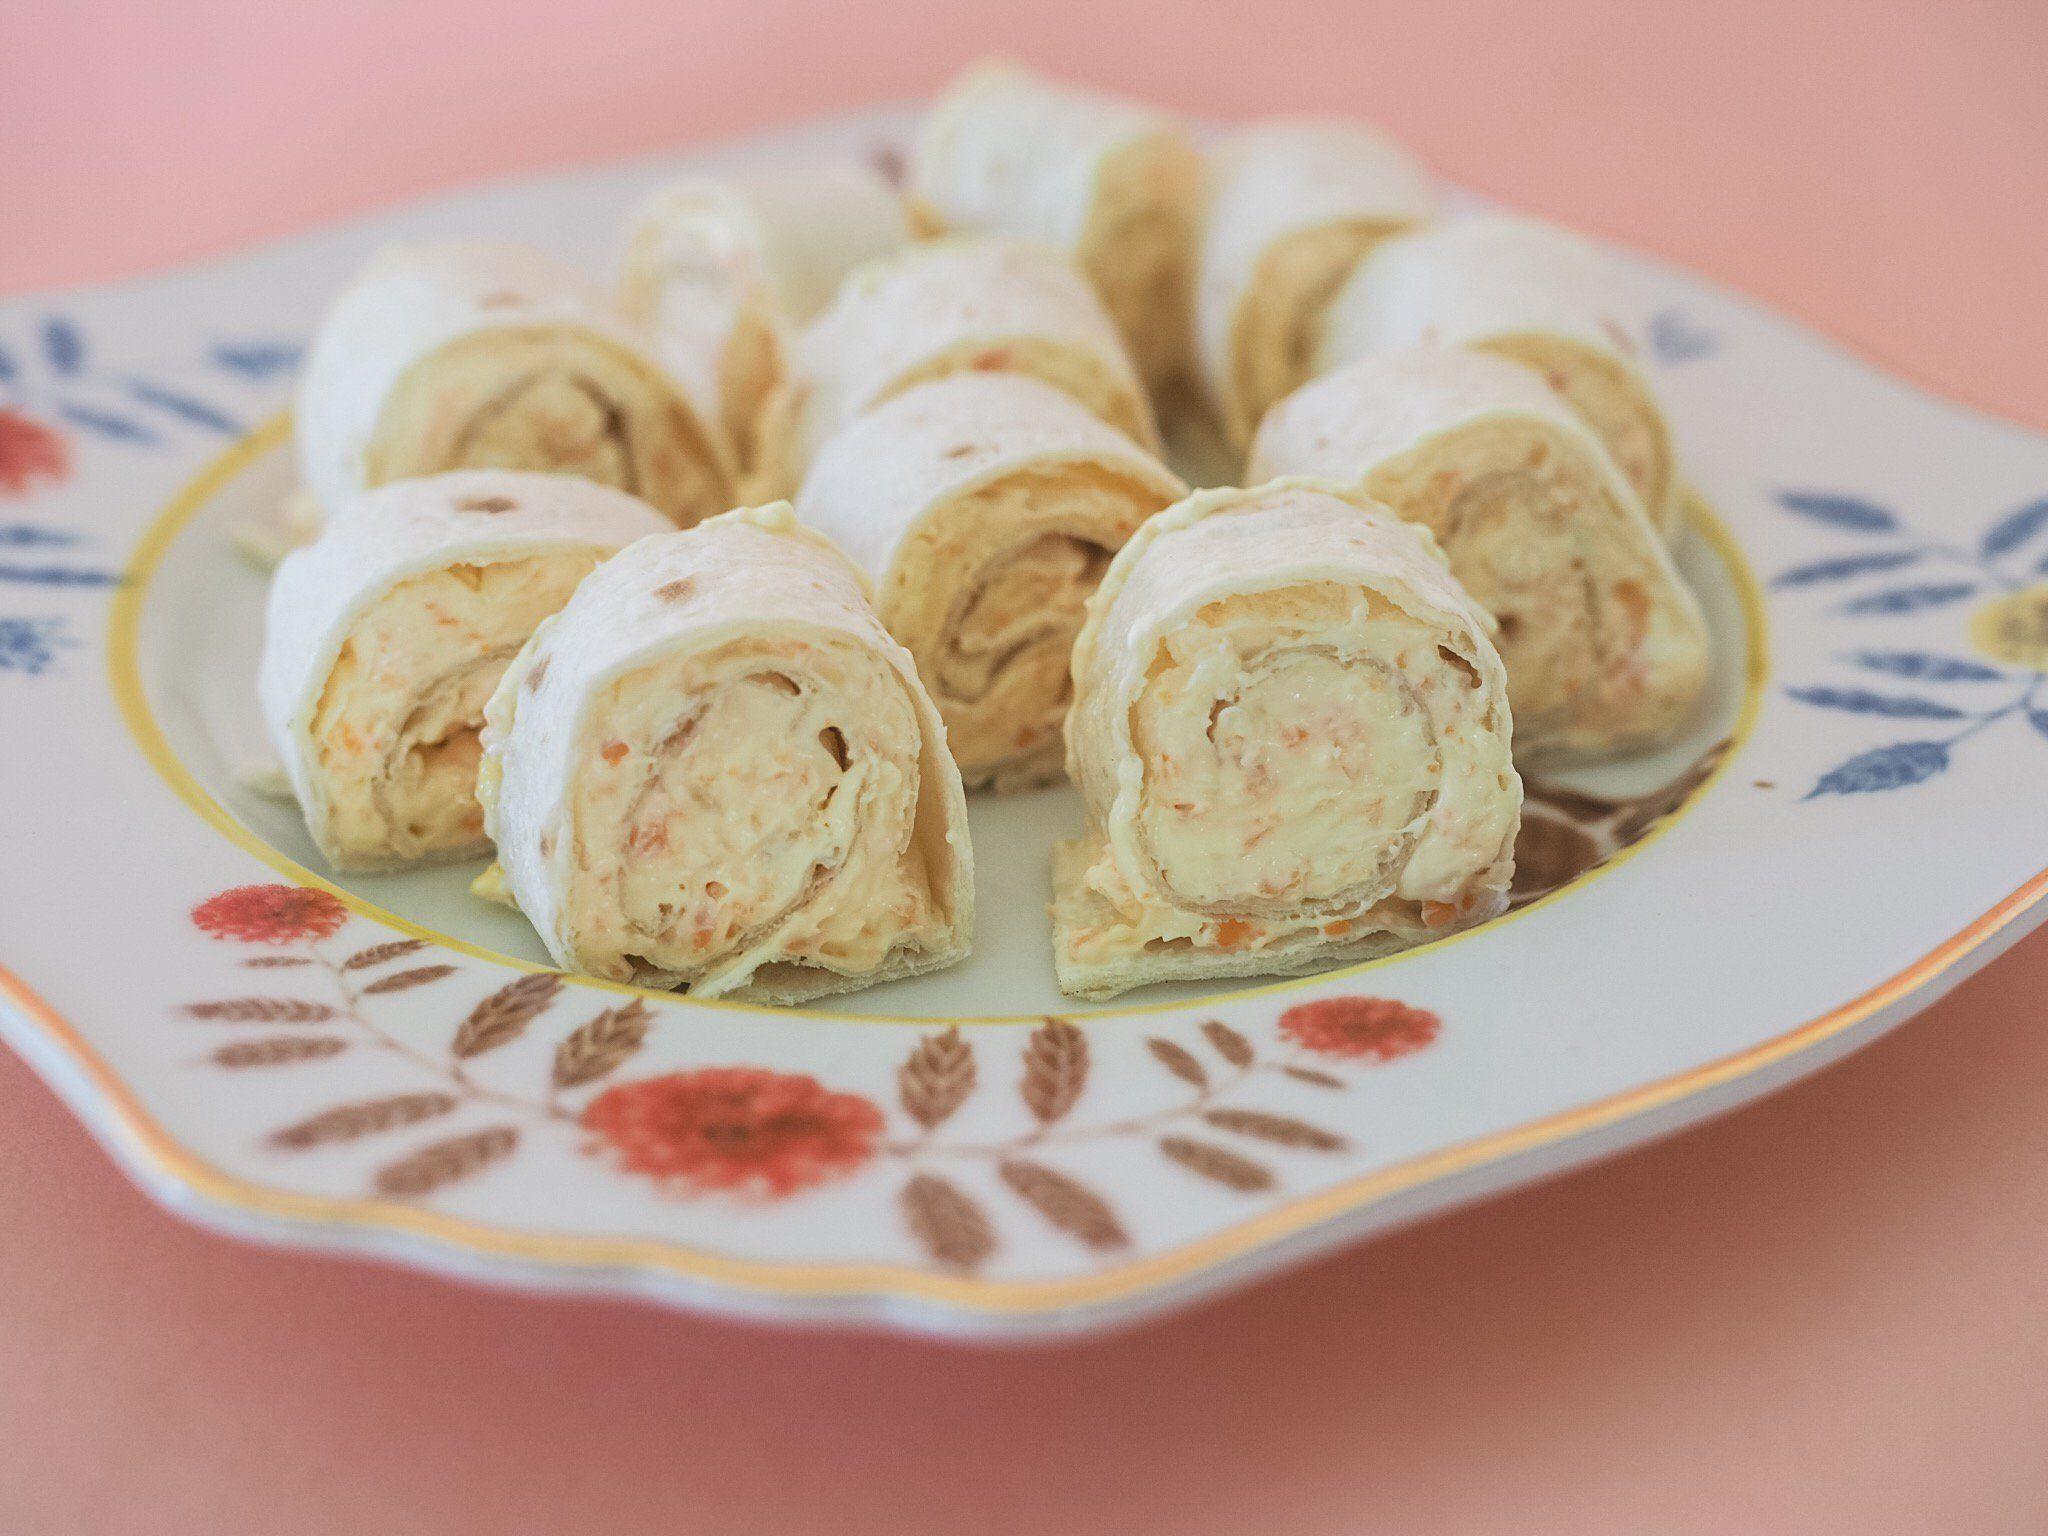 Carrot cream cheese pinwheels recipe pinwheel recipes